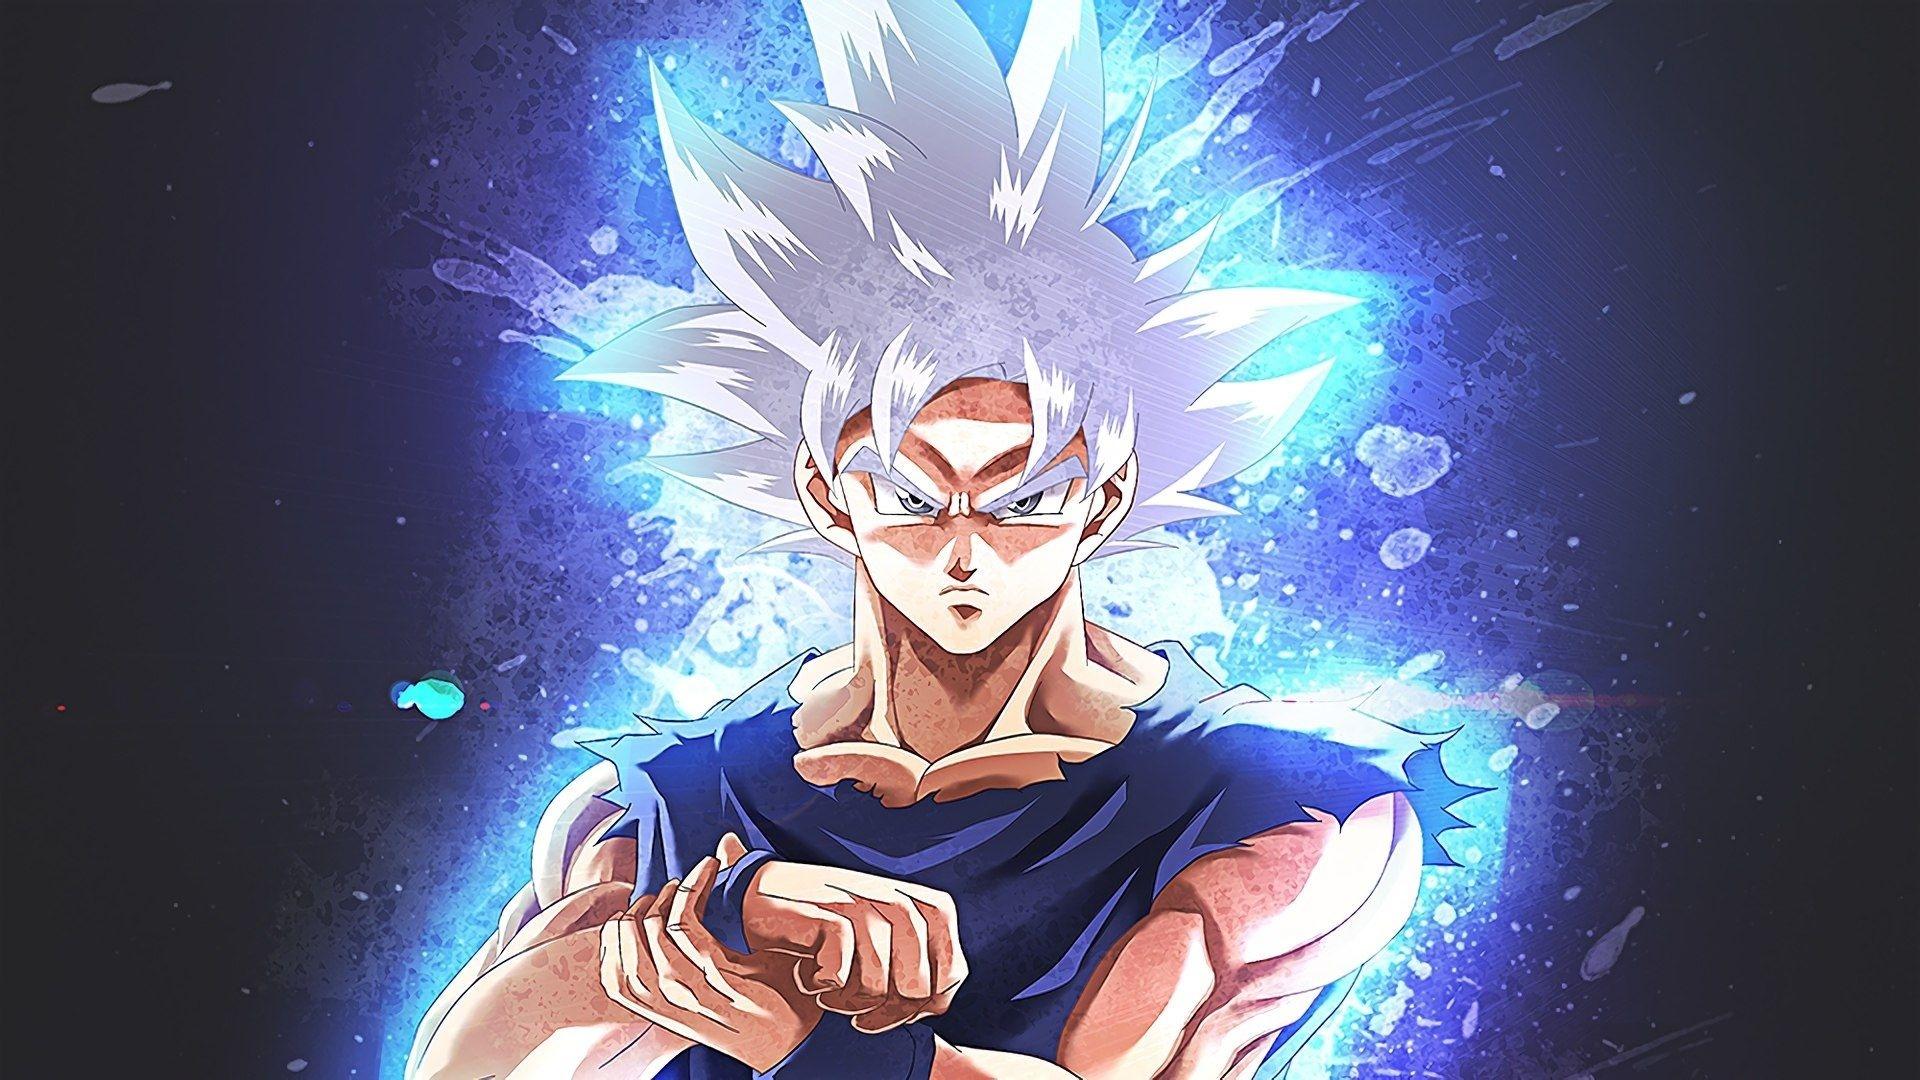 Goku Ultra Instinct cool background